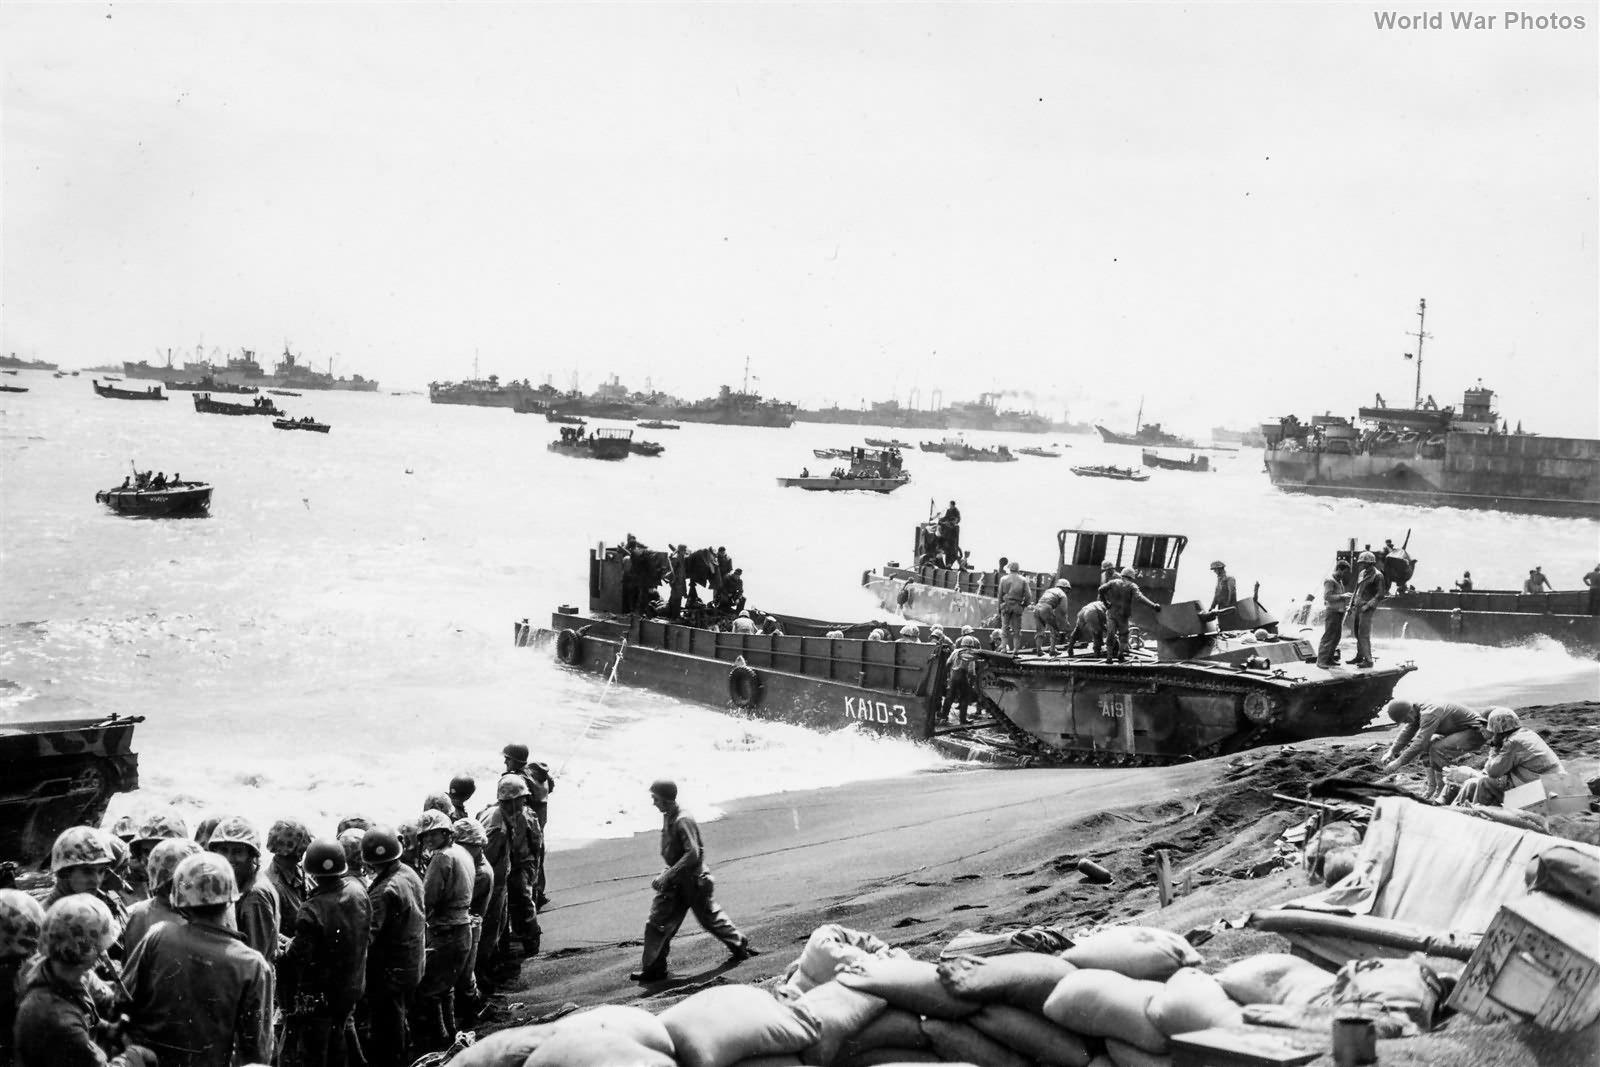 LVT DUKWs and LCVPs at Iwo Jima Beach